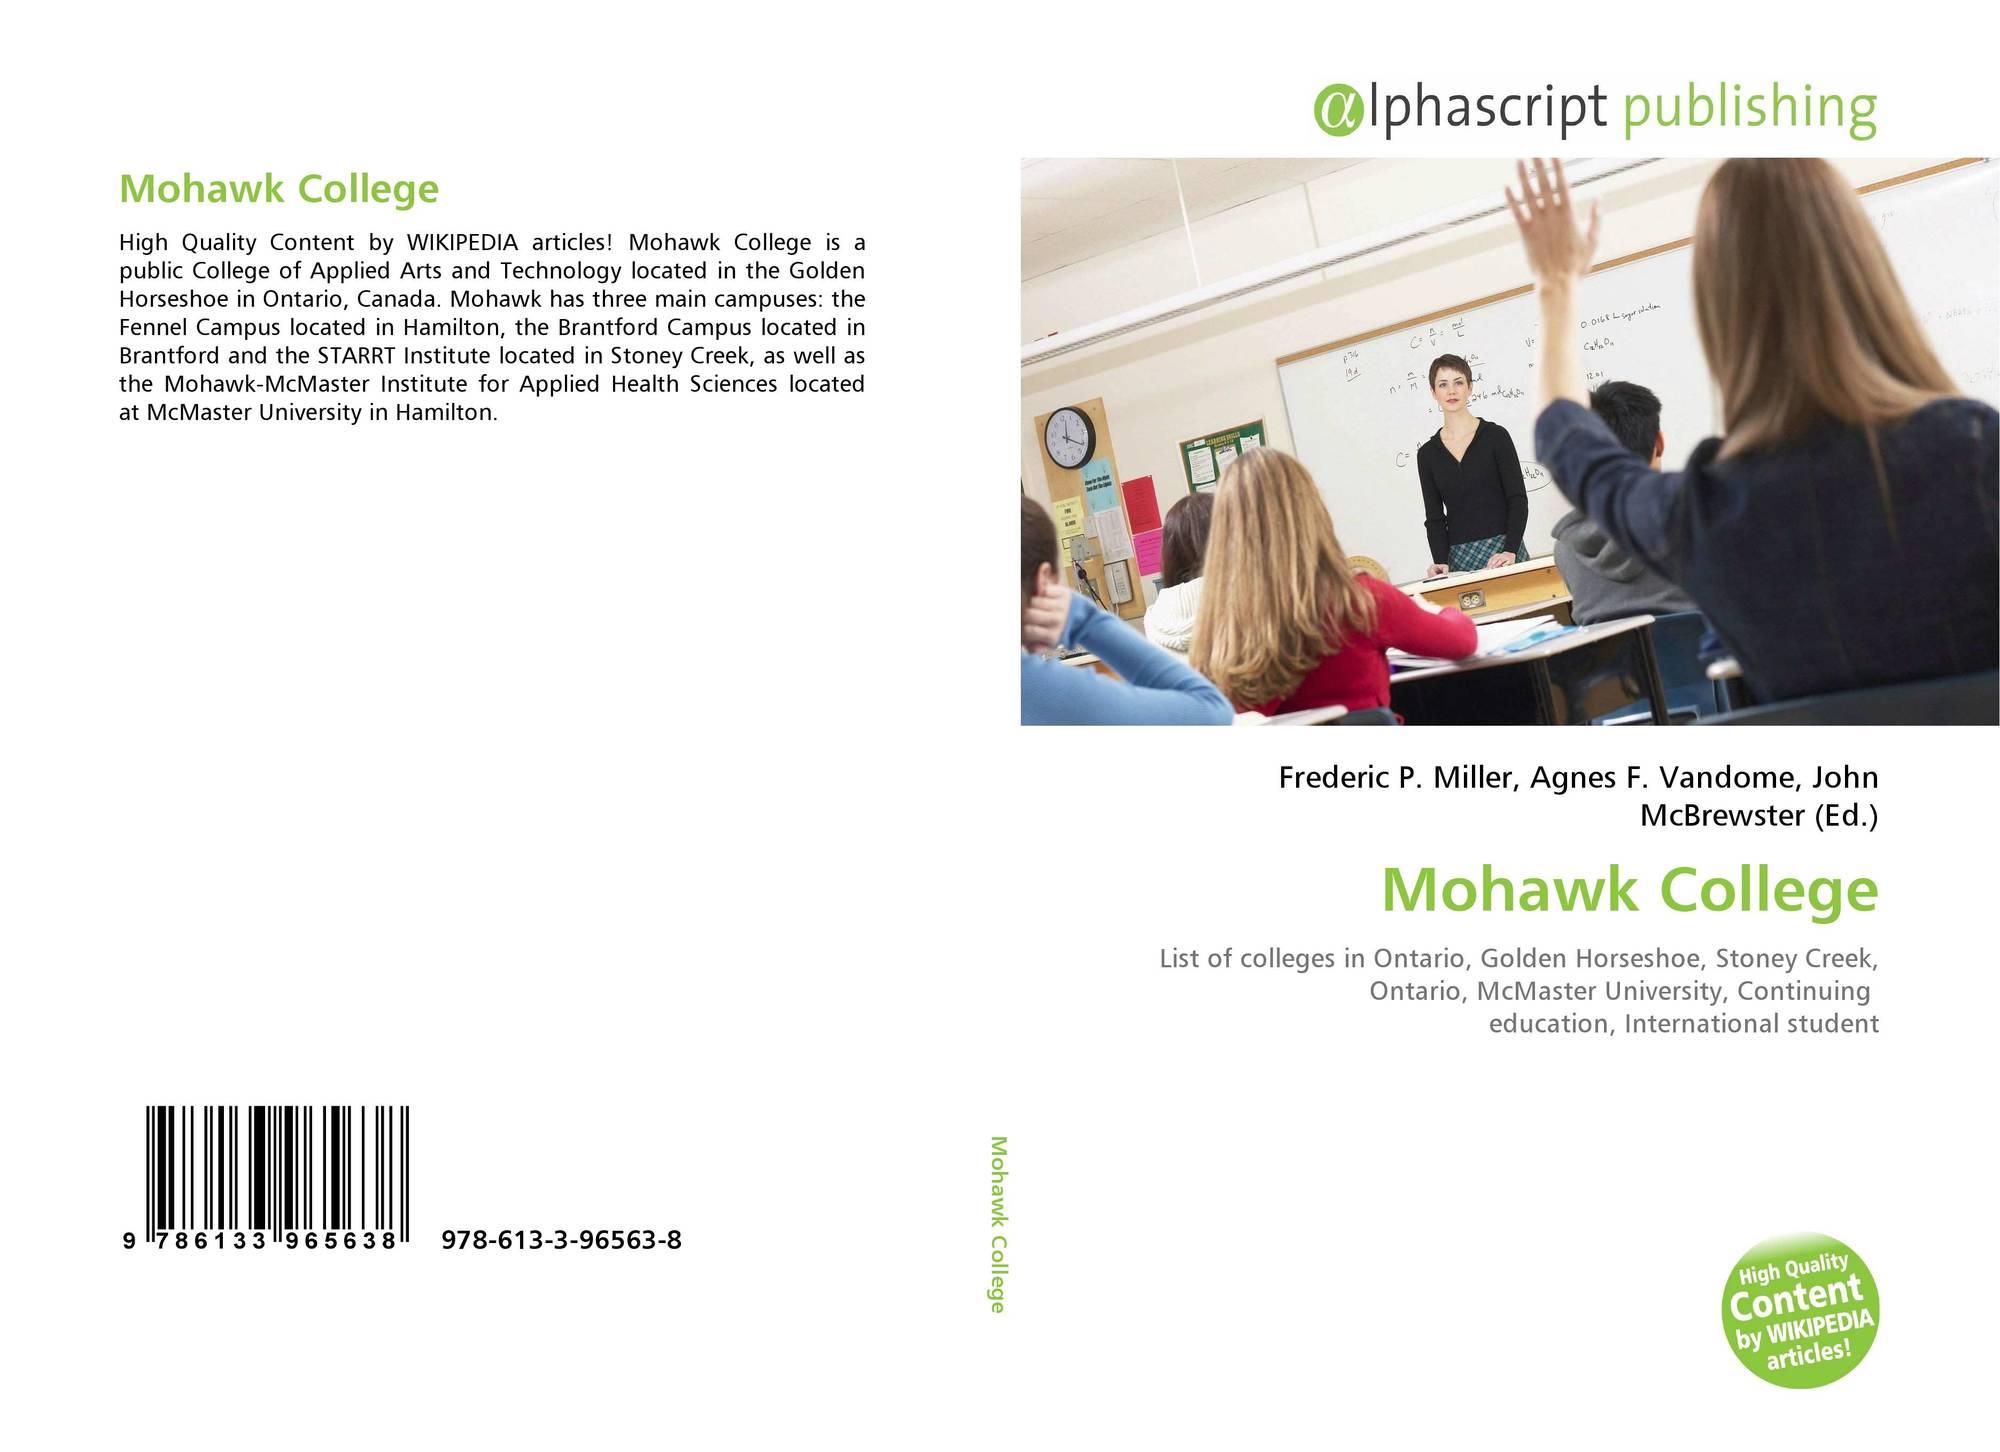 Mohawk College 978 613 3 96563 8 6133965630 9786133965638